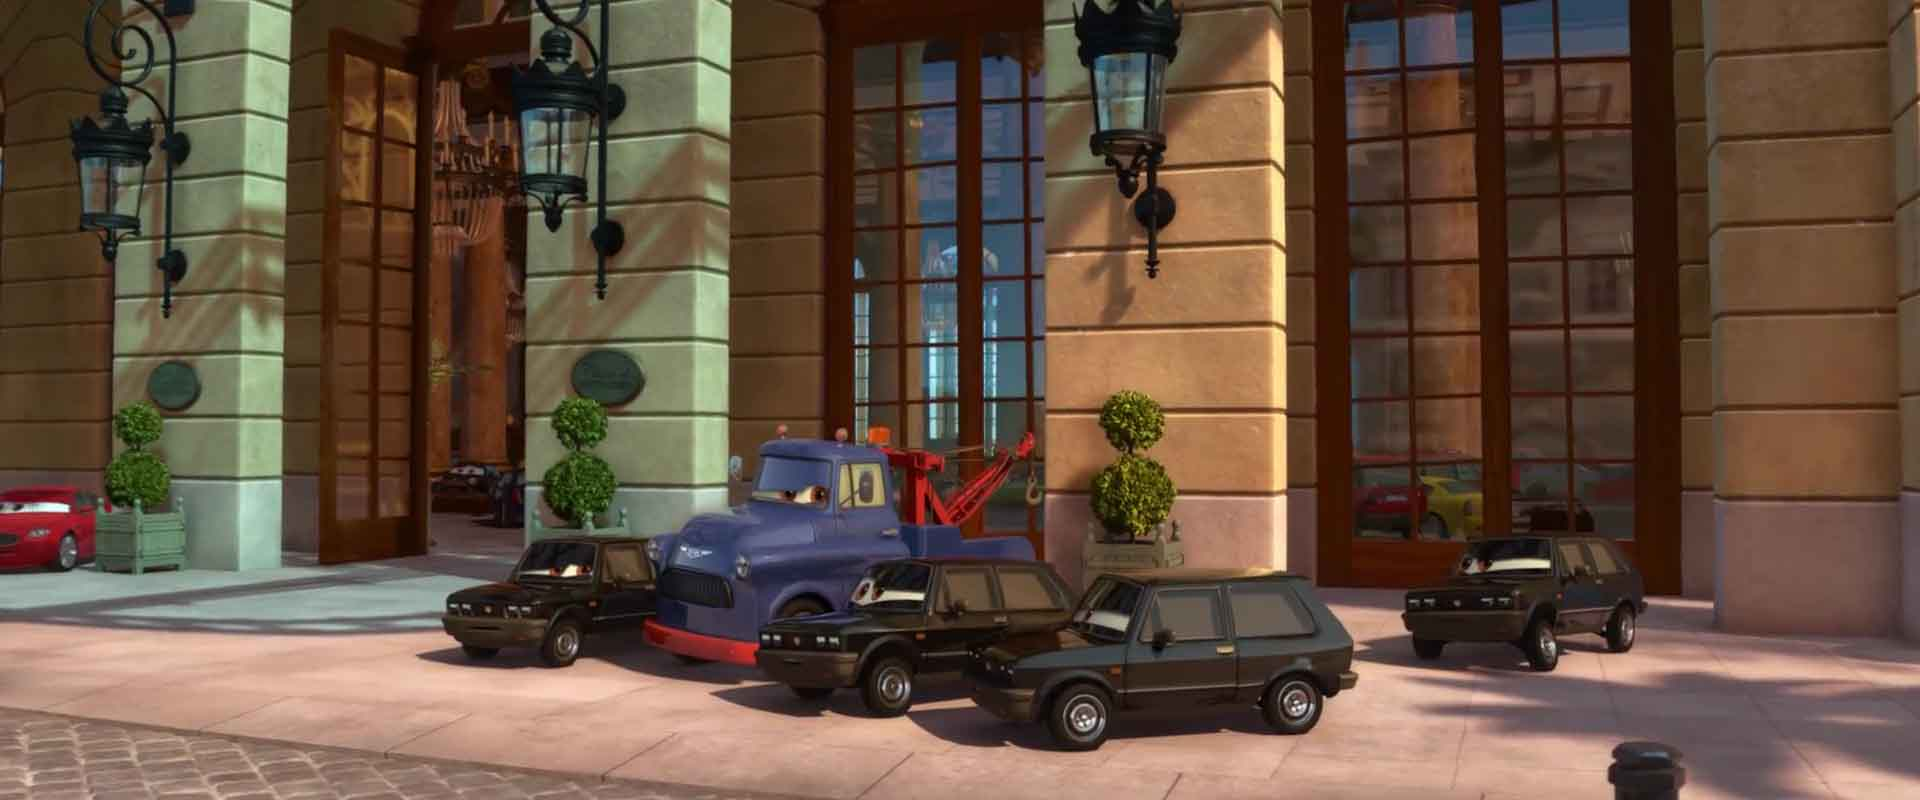 tolga-trunkov-personnage-cars-2-01